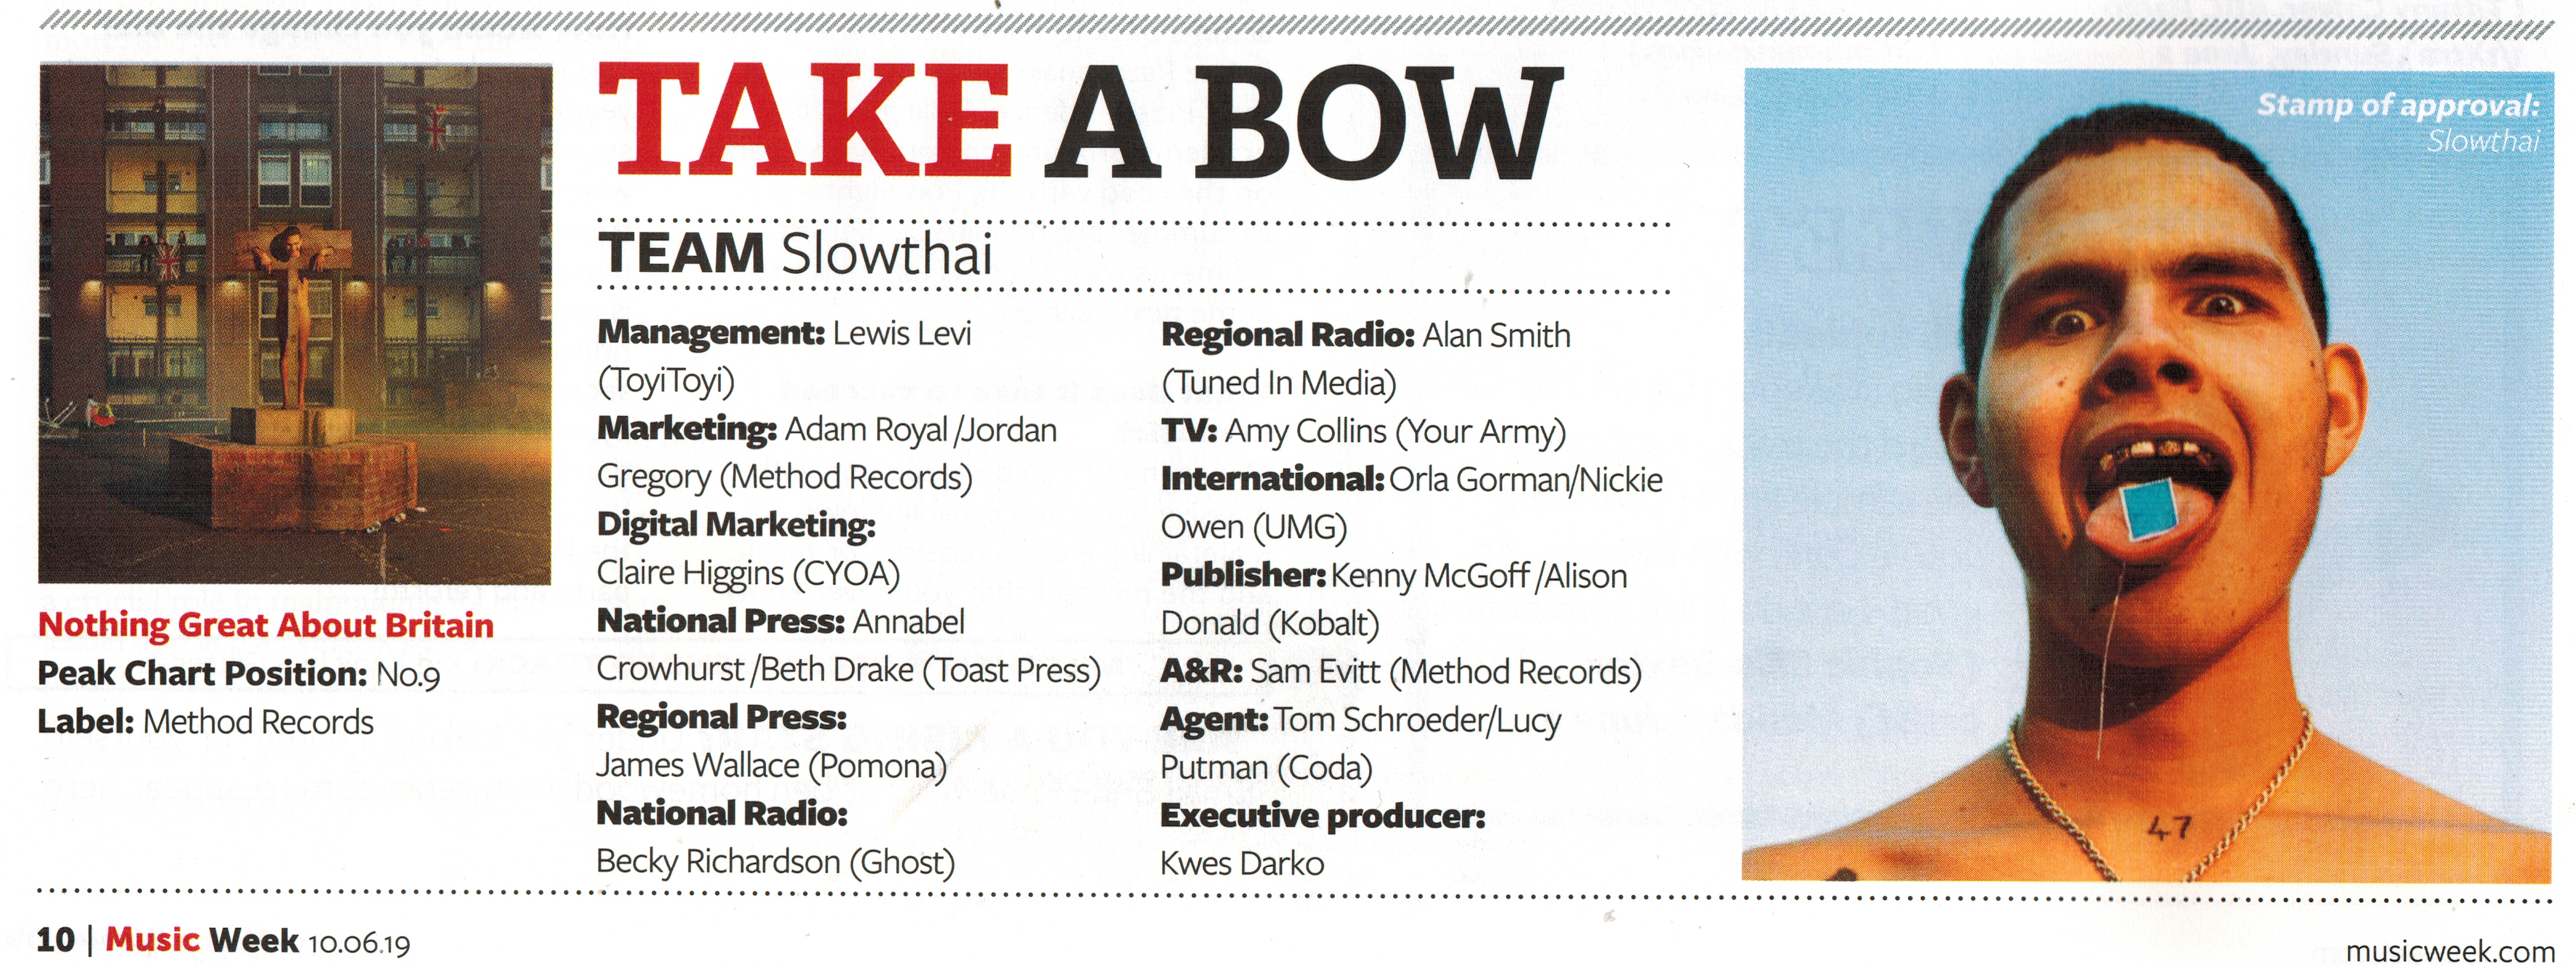 Take a bow - slowthai10062019.jpg